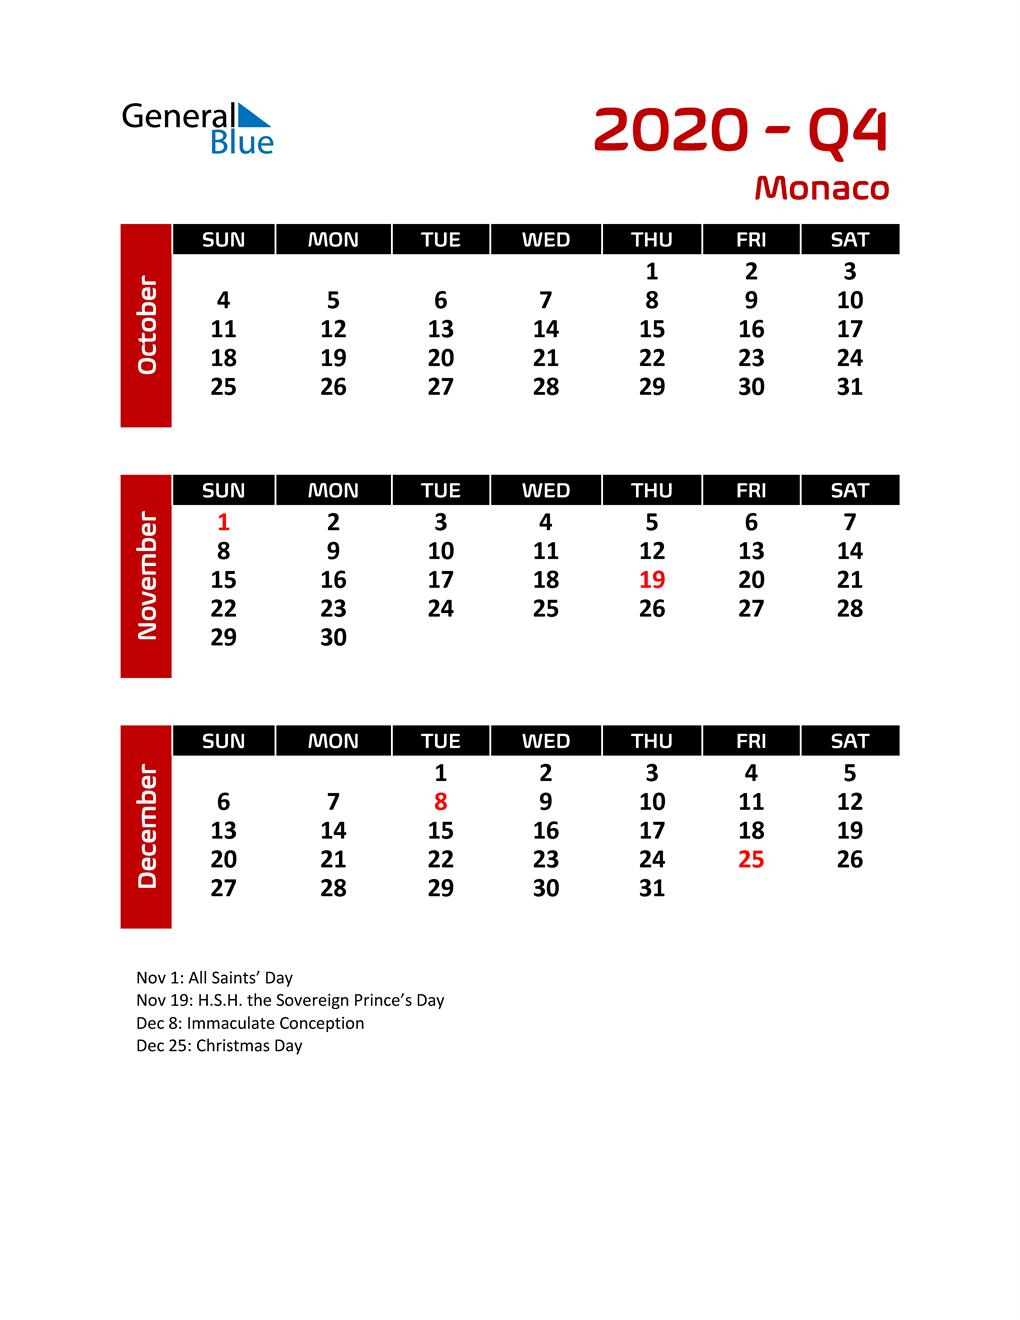 Q4 2020 Calendar with Holidays